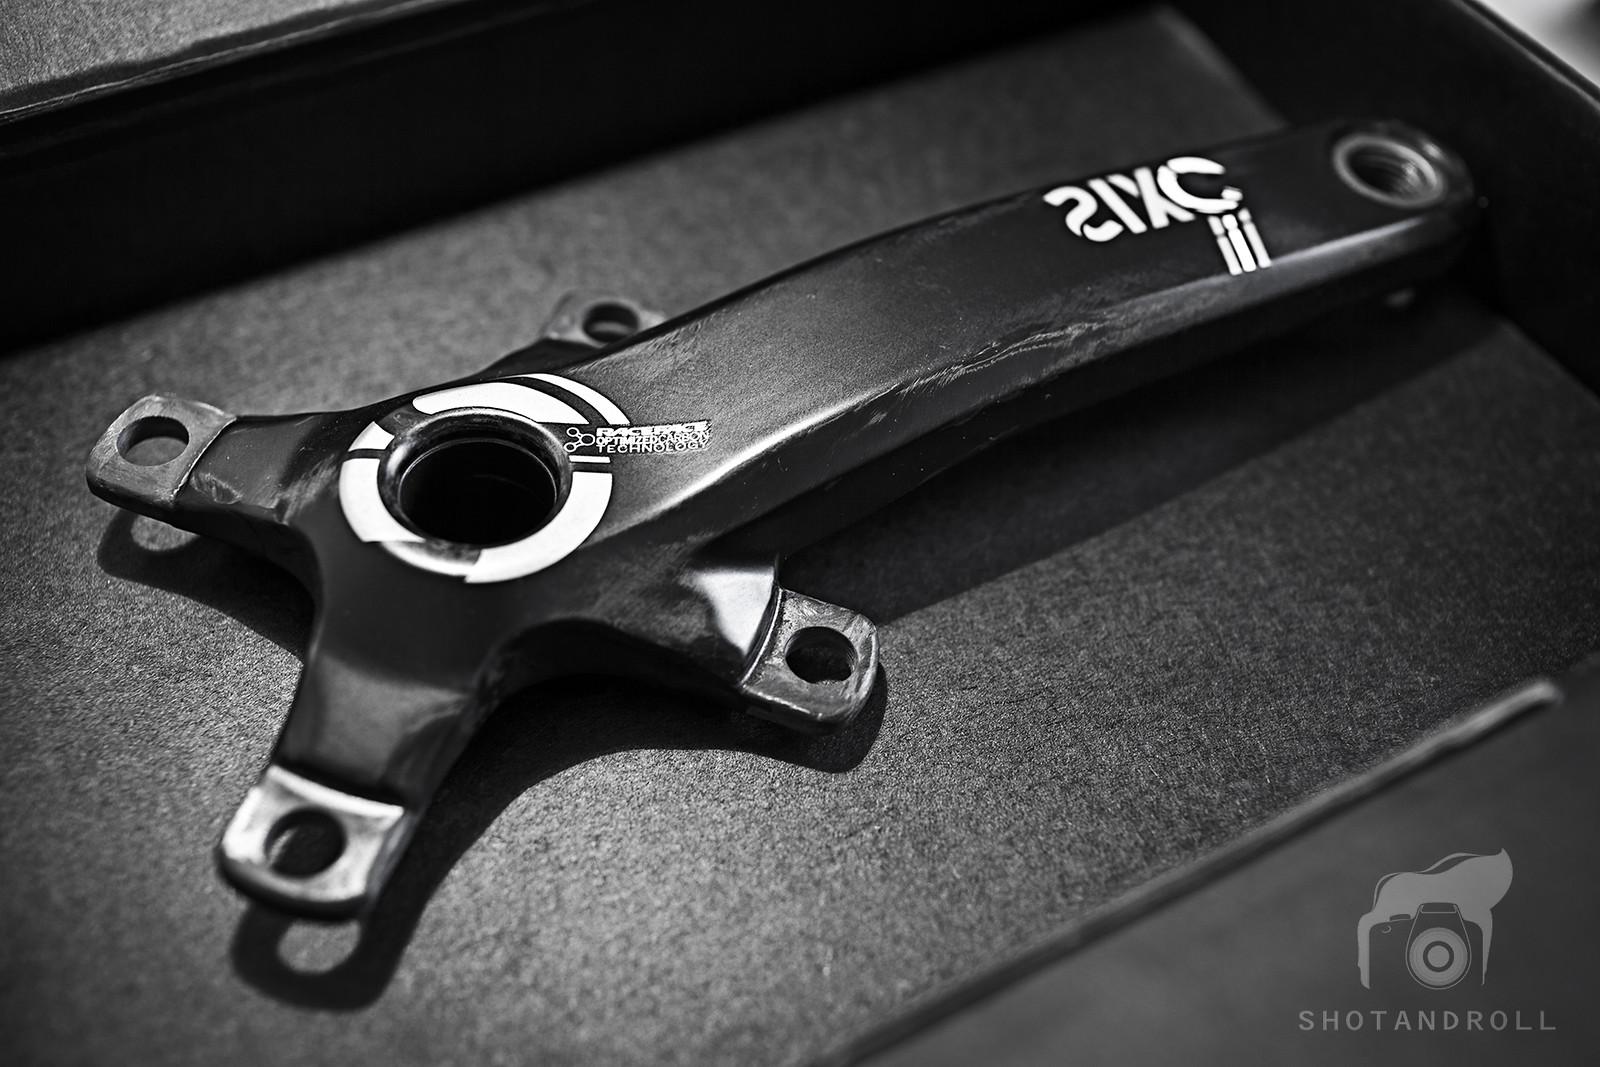 RACE FACE SIXC CARBON 83mm-165mm - Elvis - Mountain Biking Pictures - Vital MTB